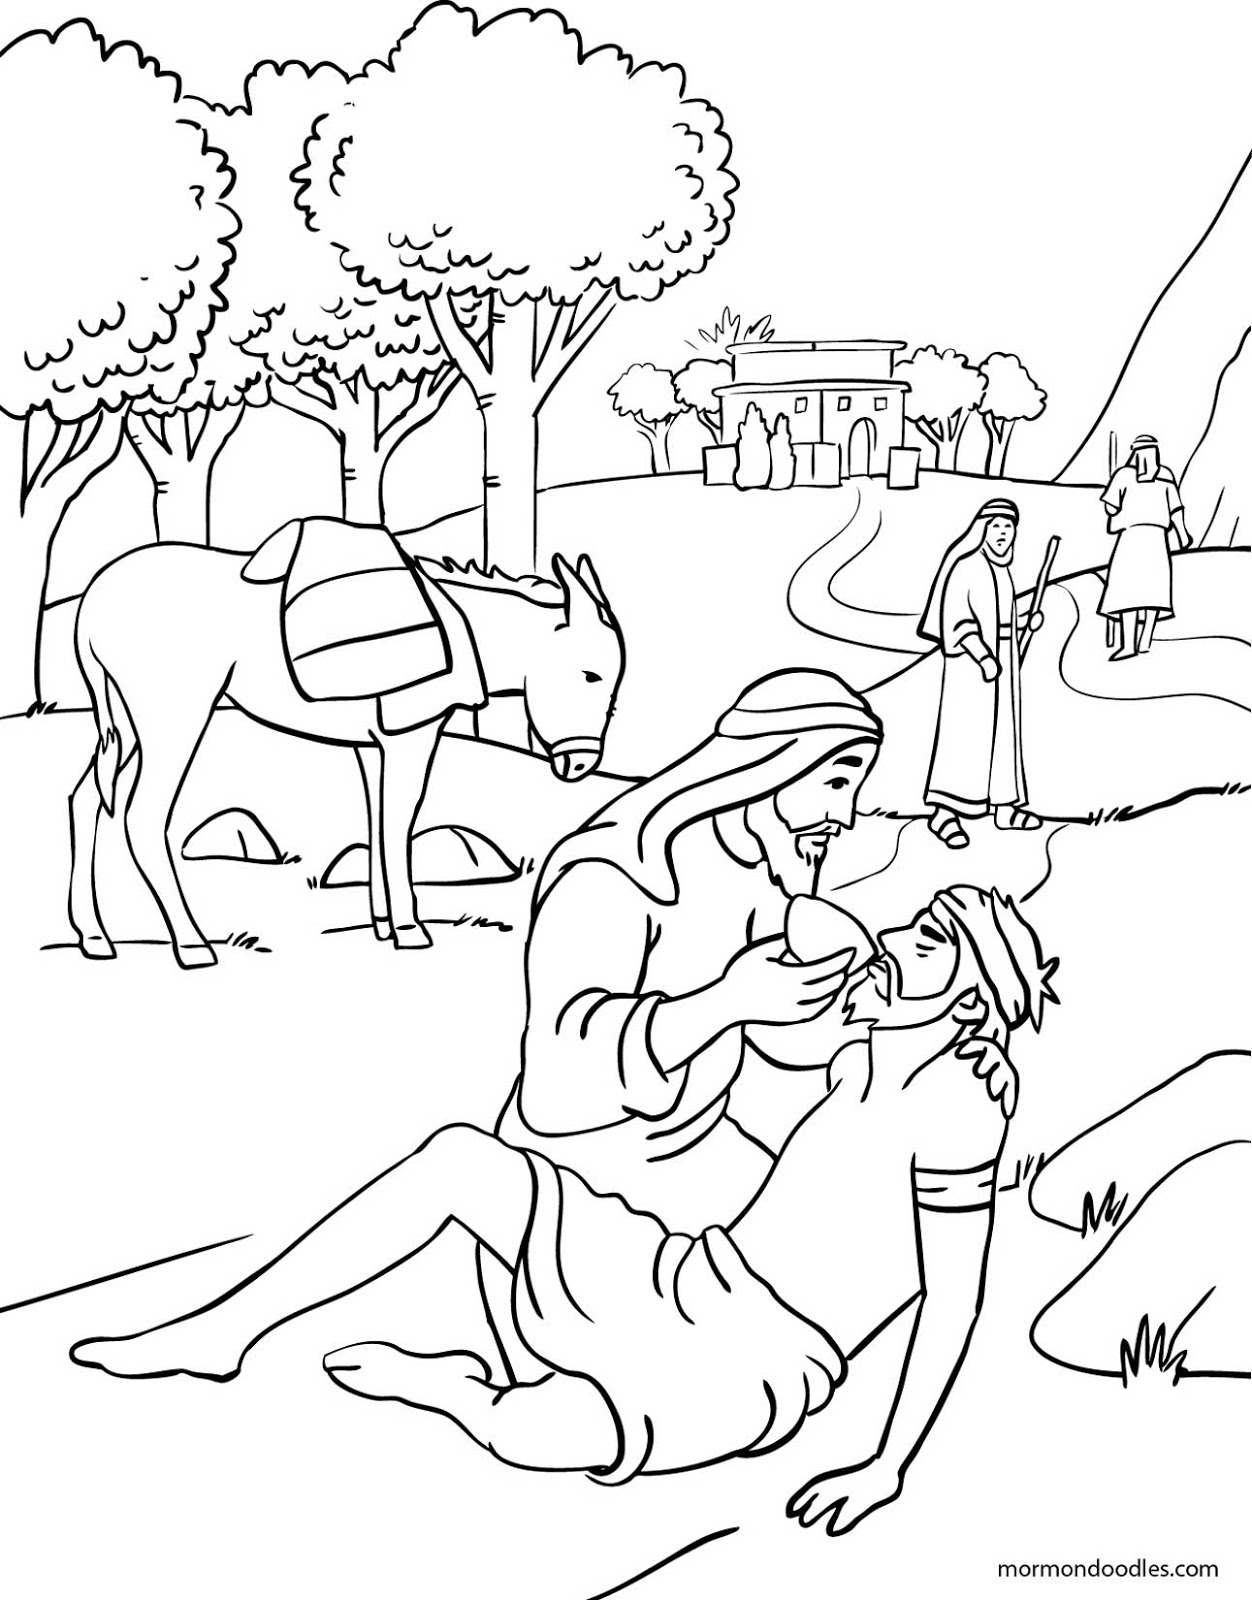 1252x1600 Good Samaritan Coloring Page Awesome Good Samaritan Coloring Page